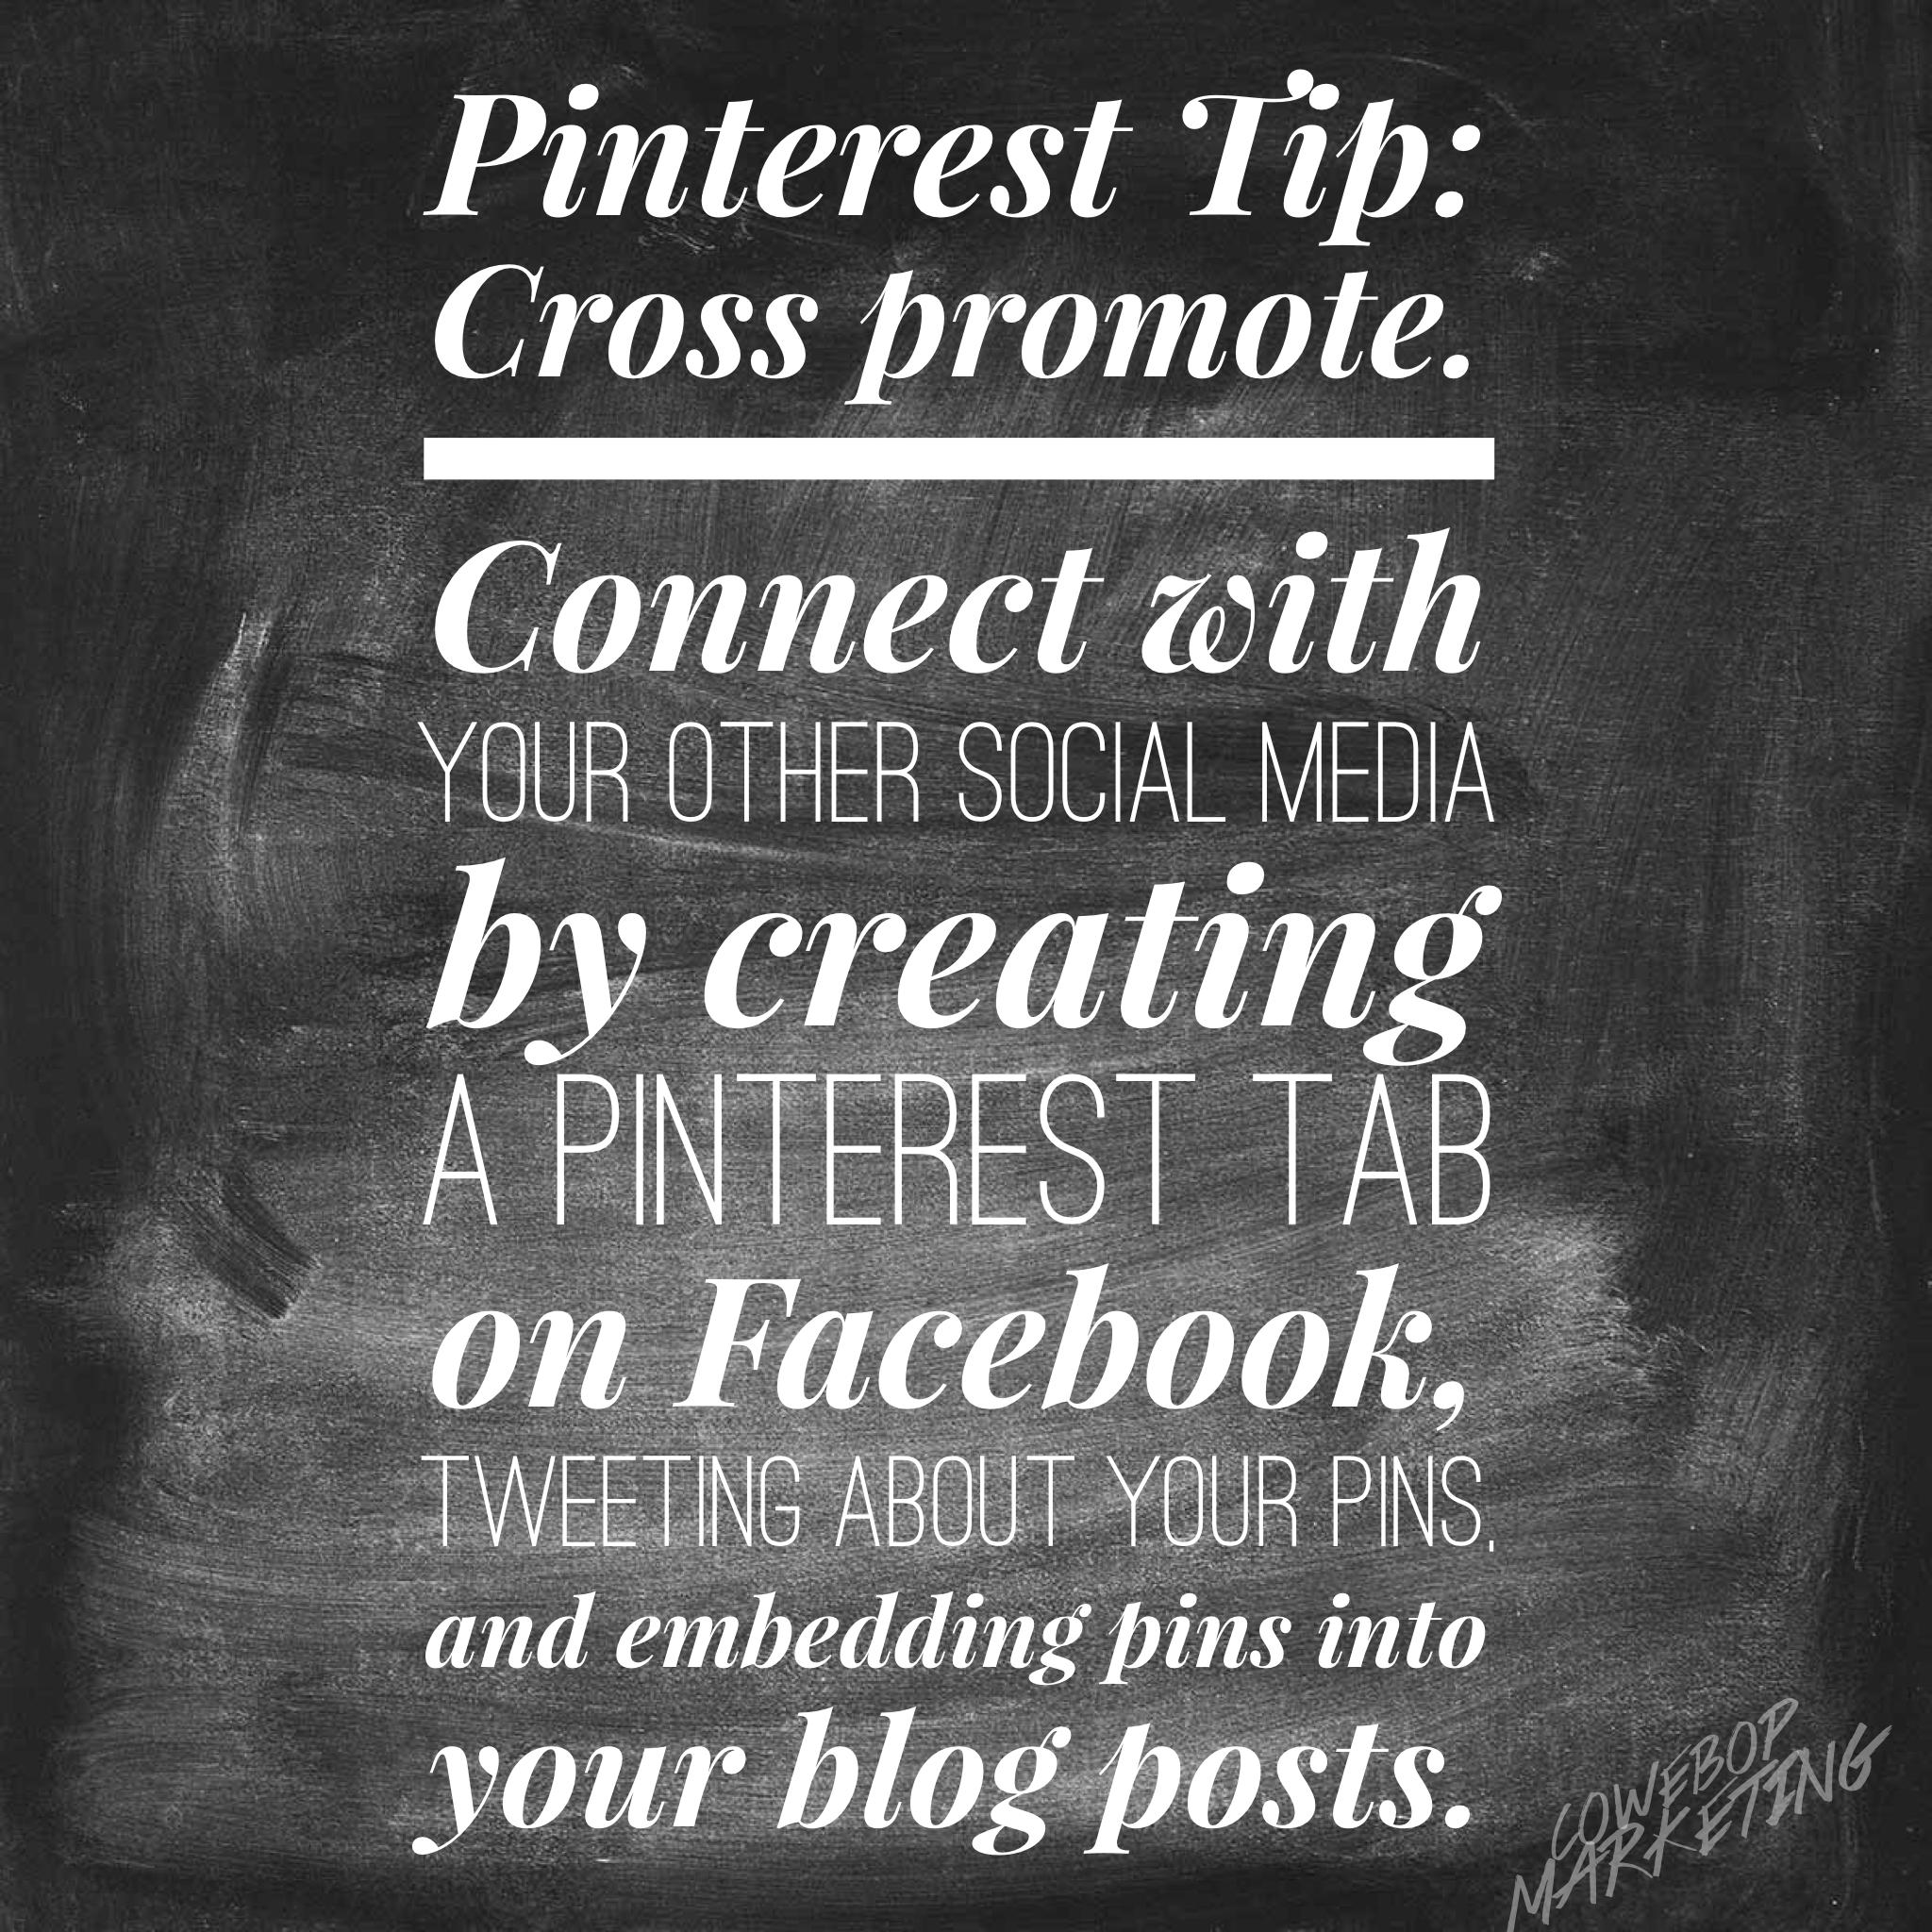 Pinterest Infographic Tips